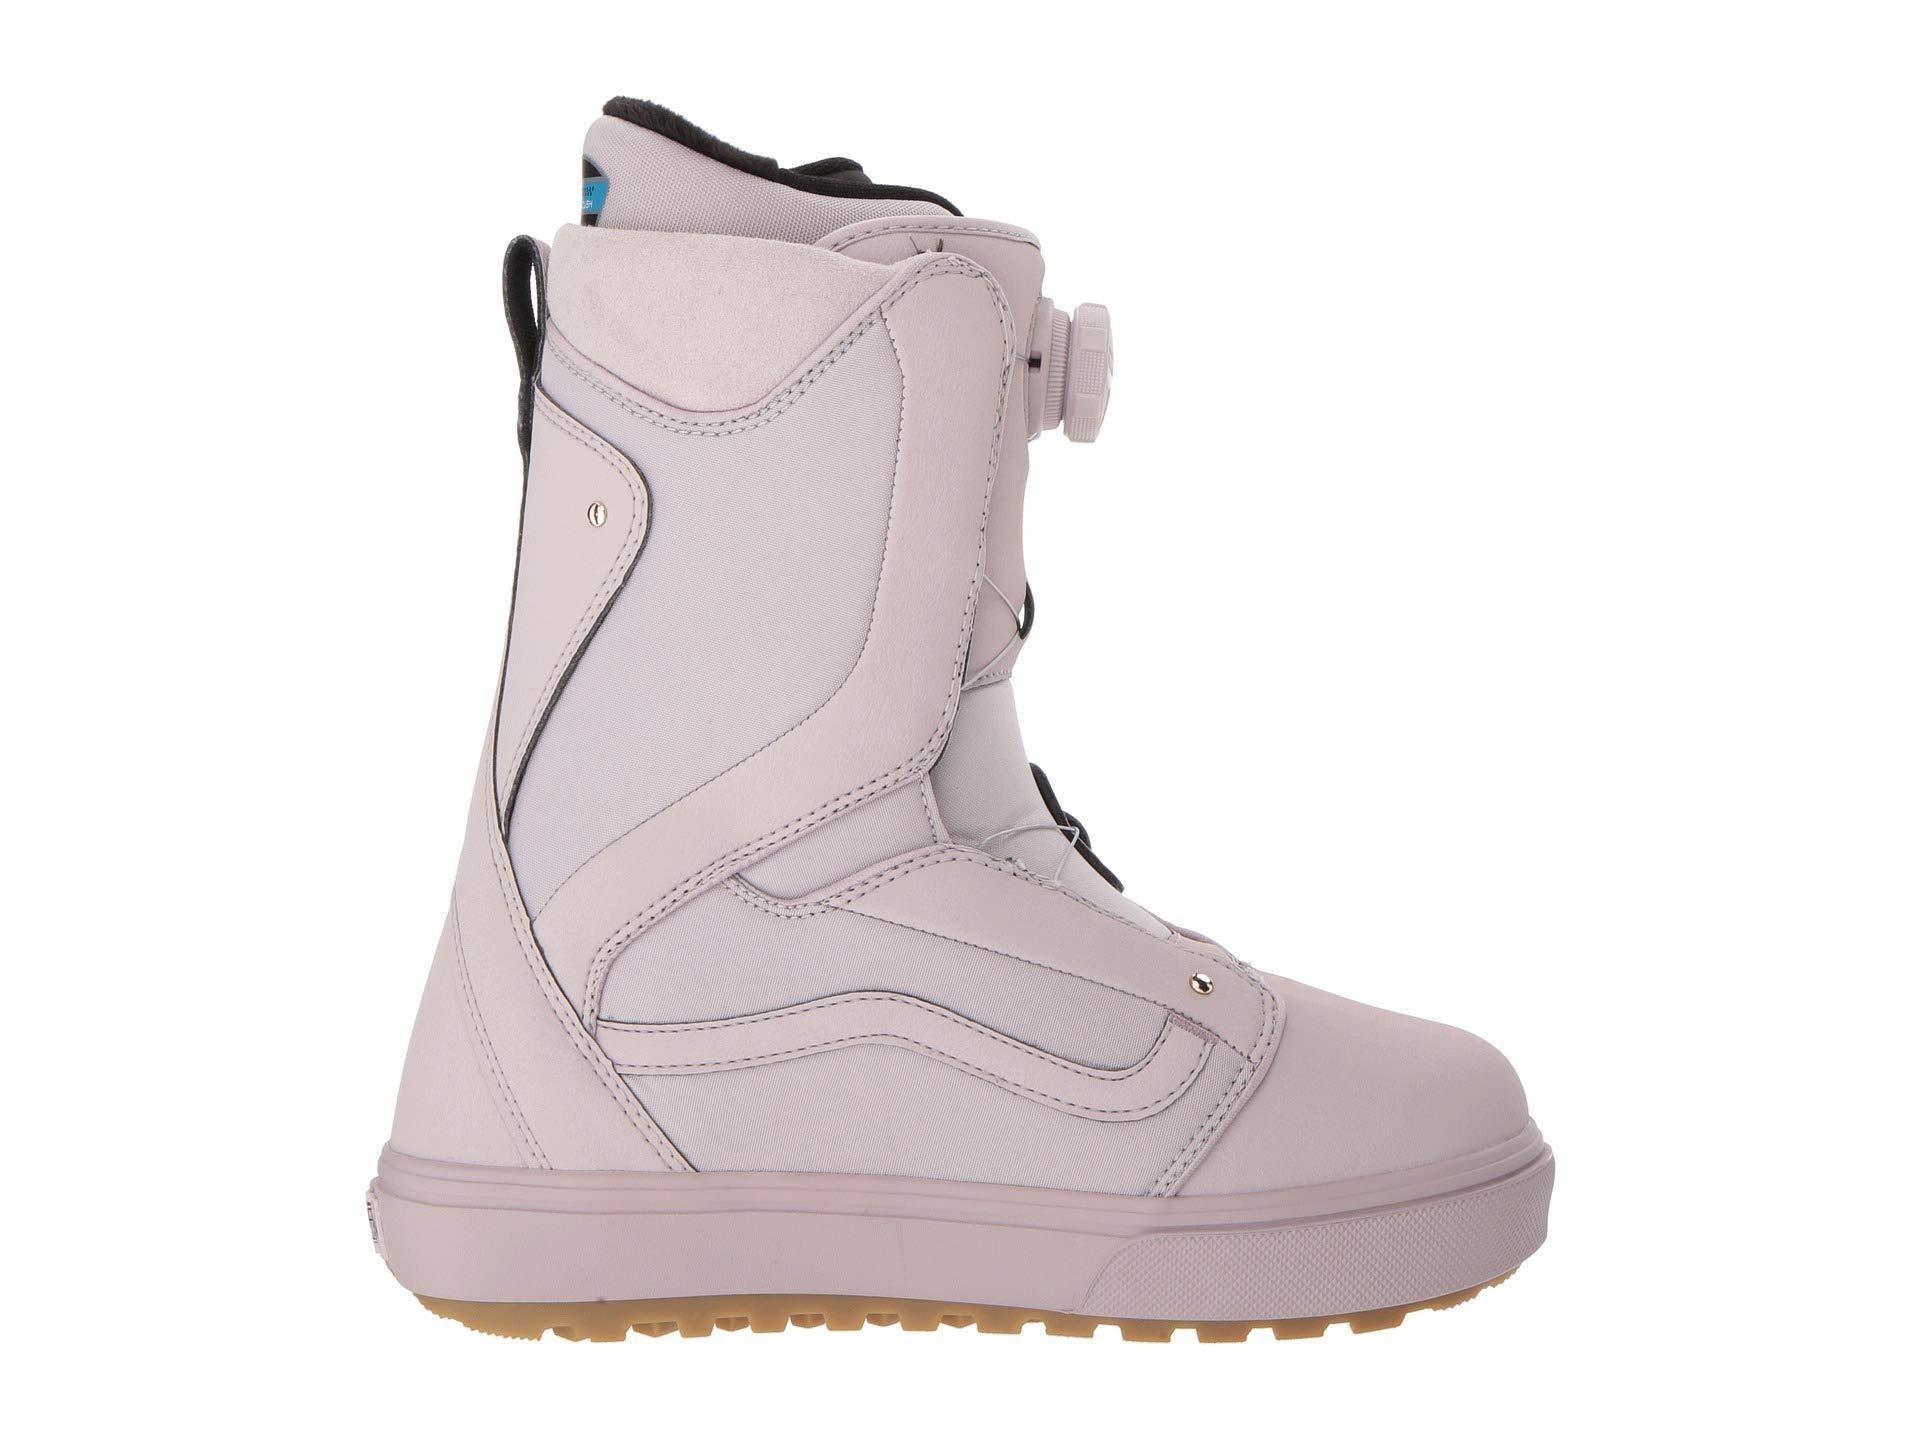 ed2efc38f888ca Lyst - Vans Encoretm Og  18 (sea Fog gum) Women s Snow Shoes